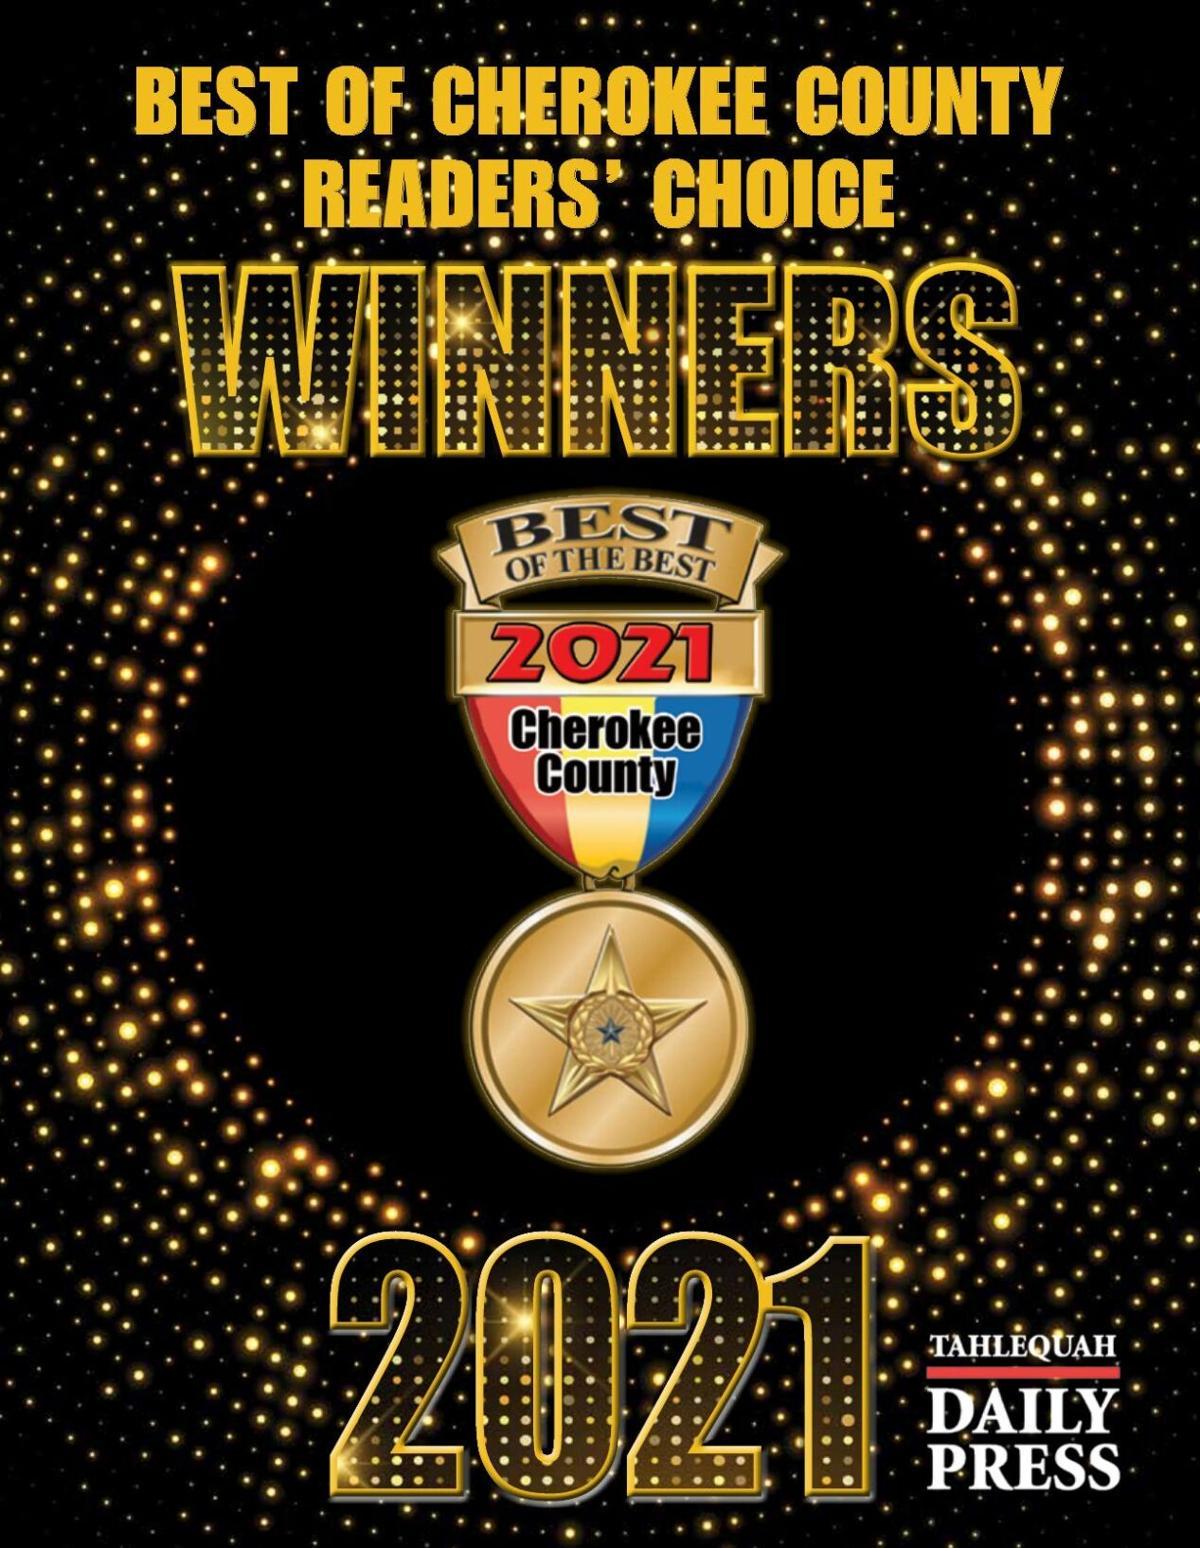 2021 Reader's Choice Winners